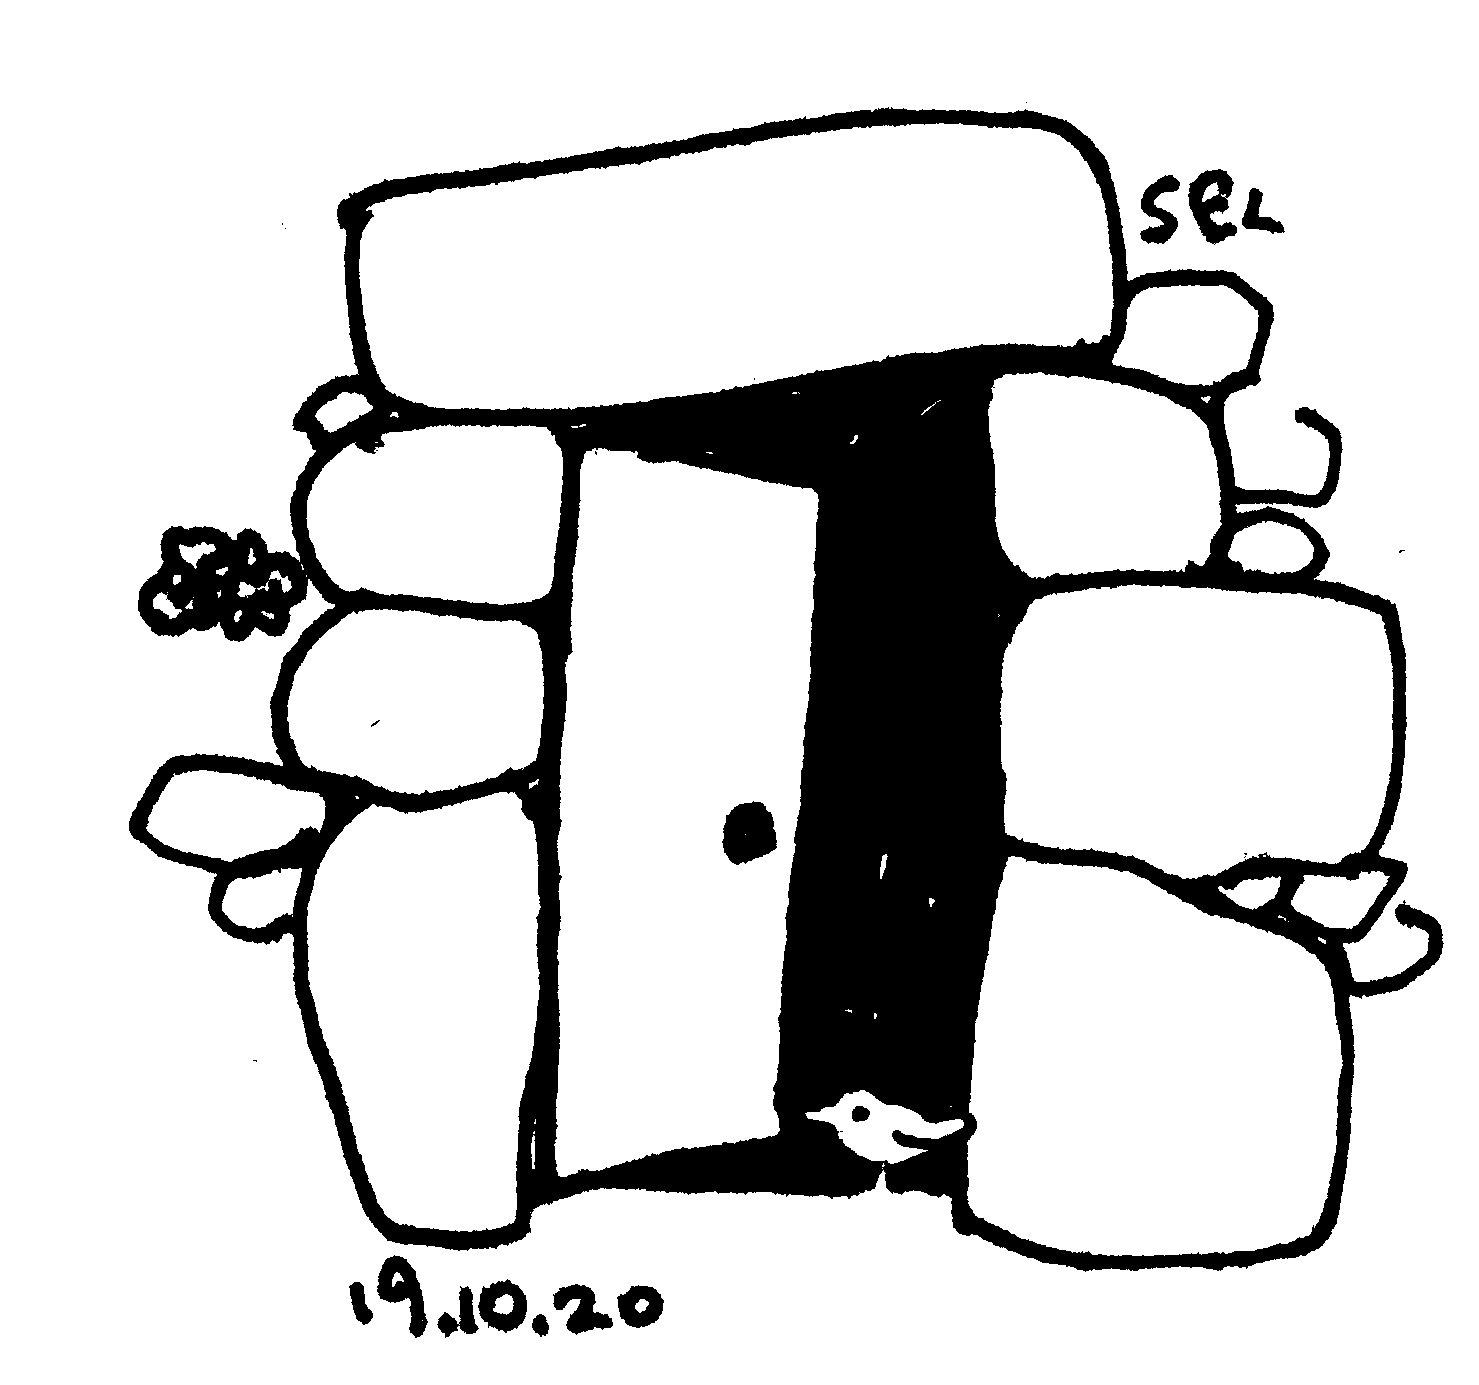 19_10_20039